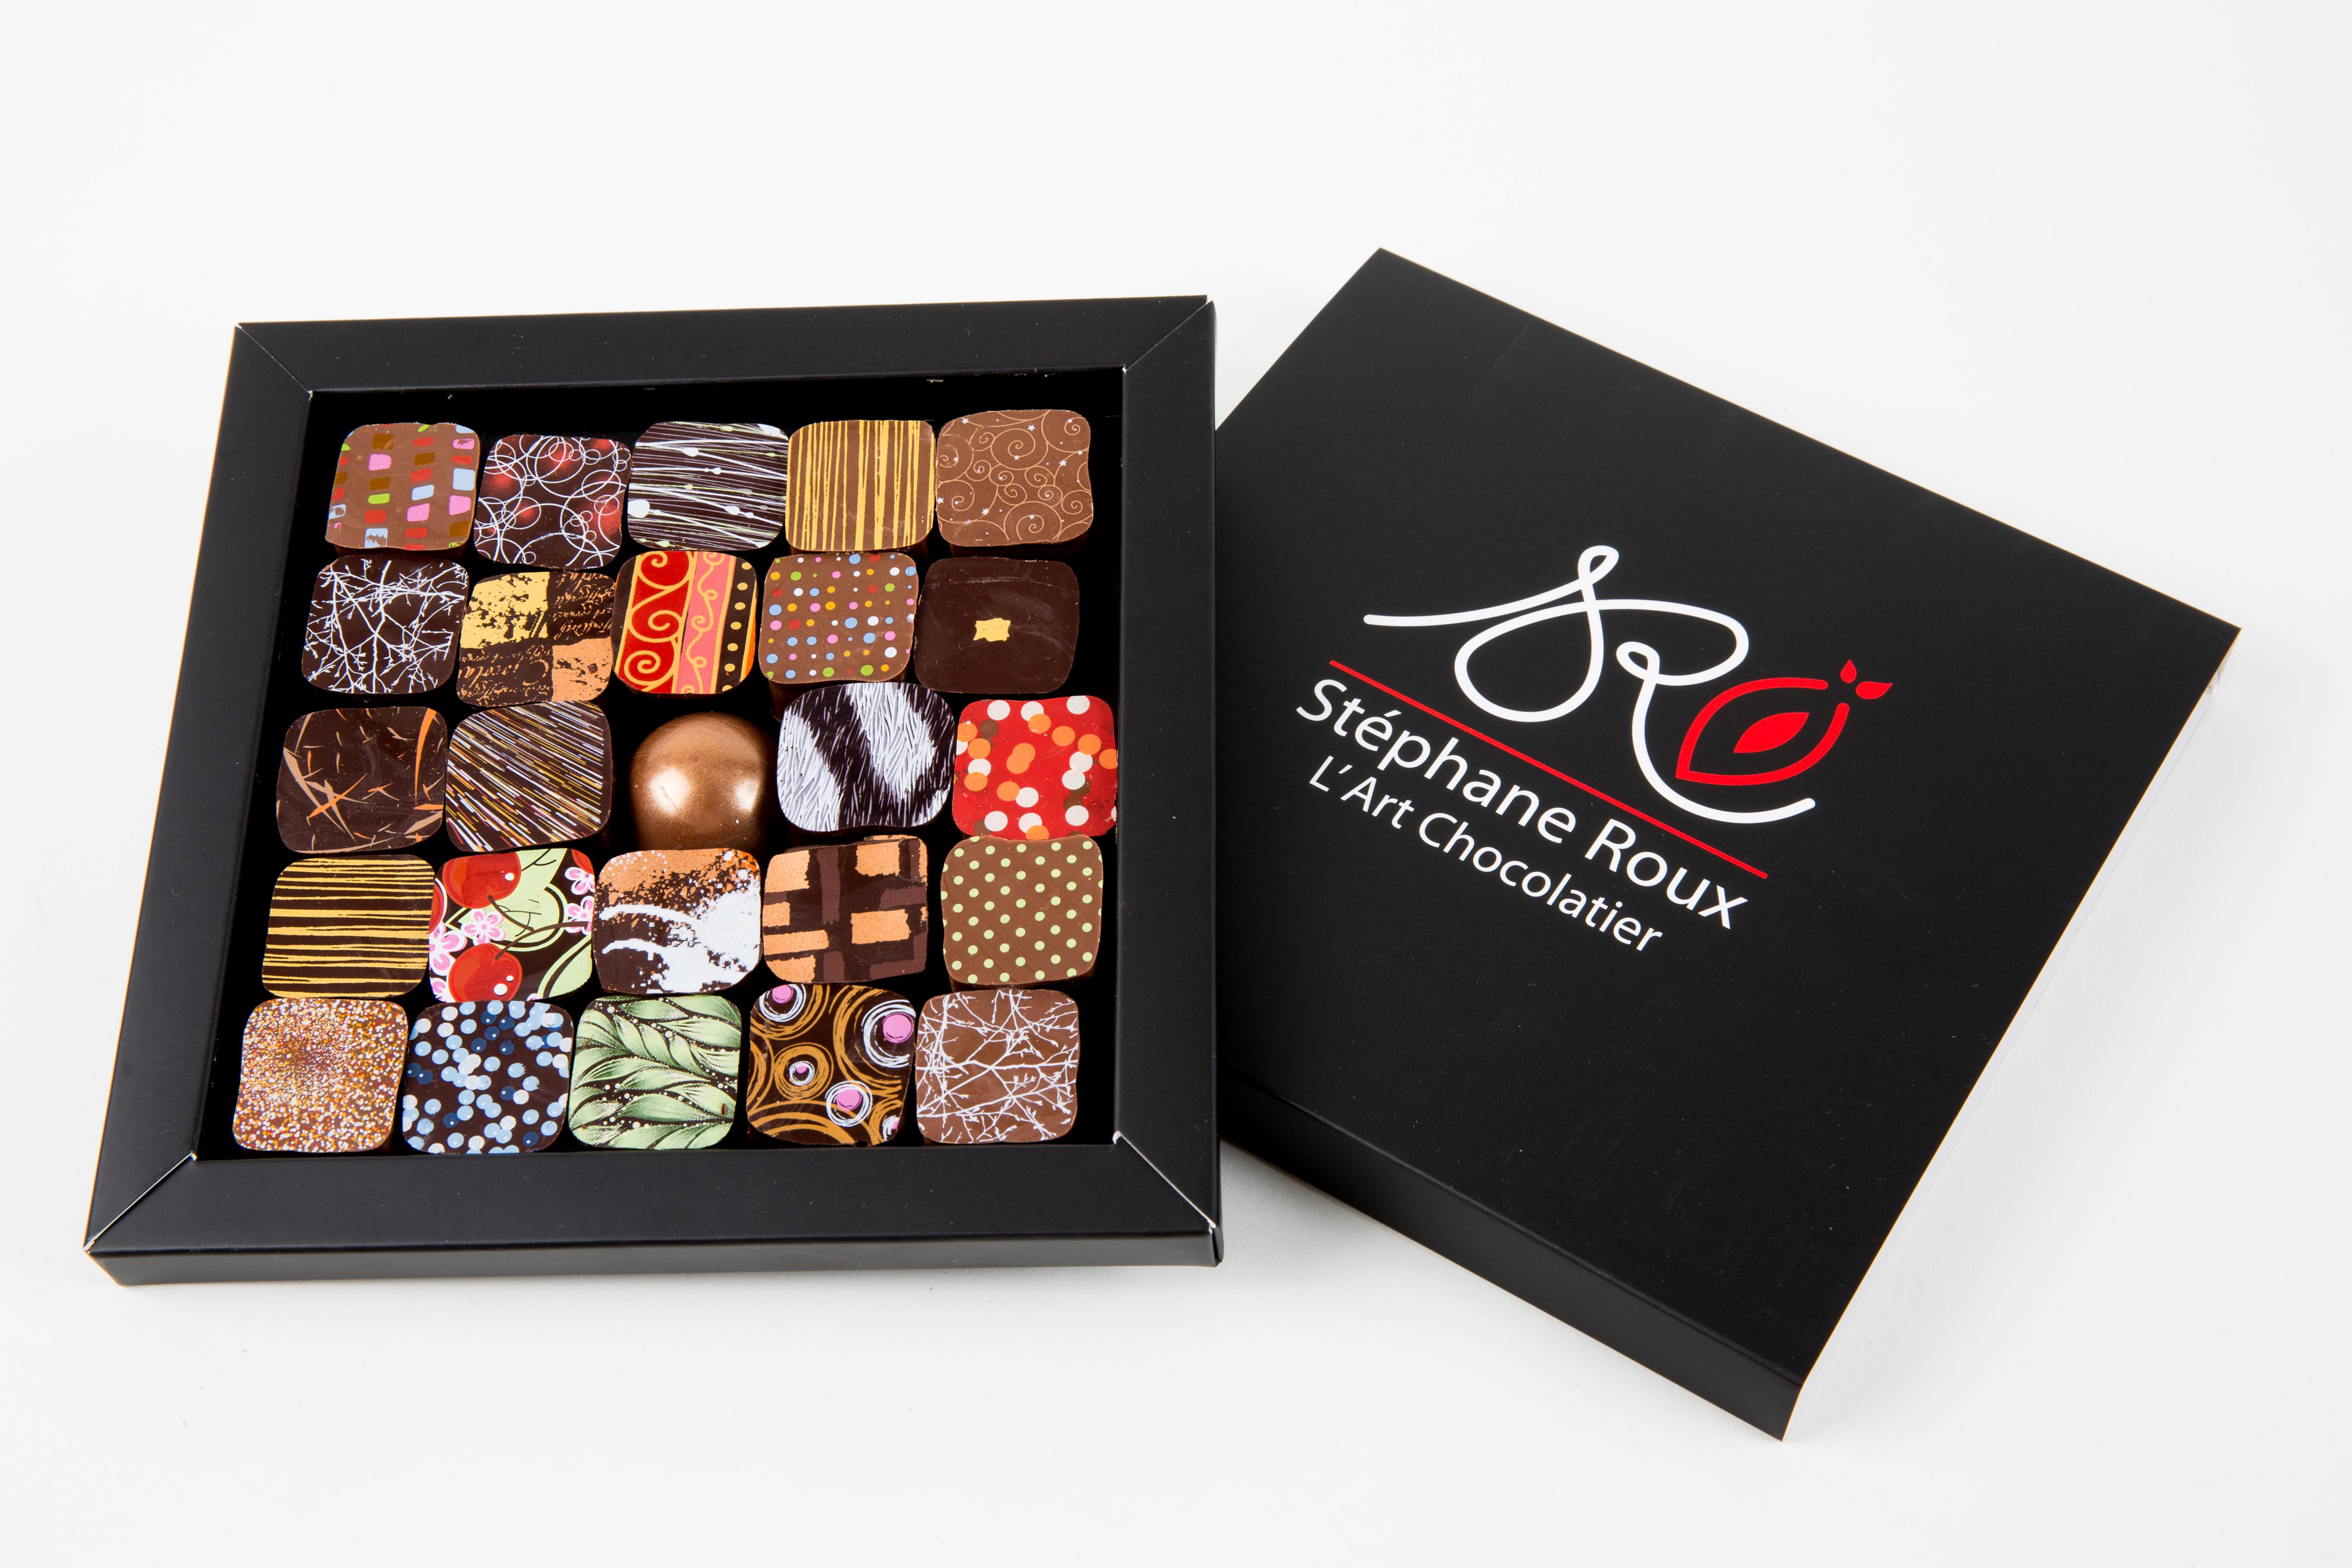 chocolats st phane roux le blog de guillaume ghrenassia. Black Bedroom Furniture Sets. Home Design Ideas